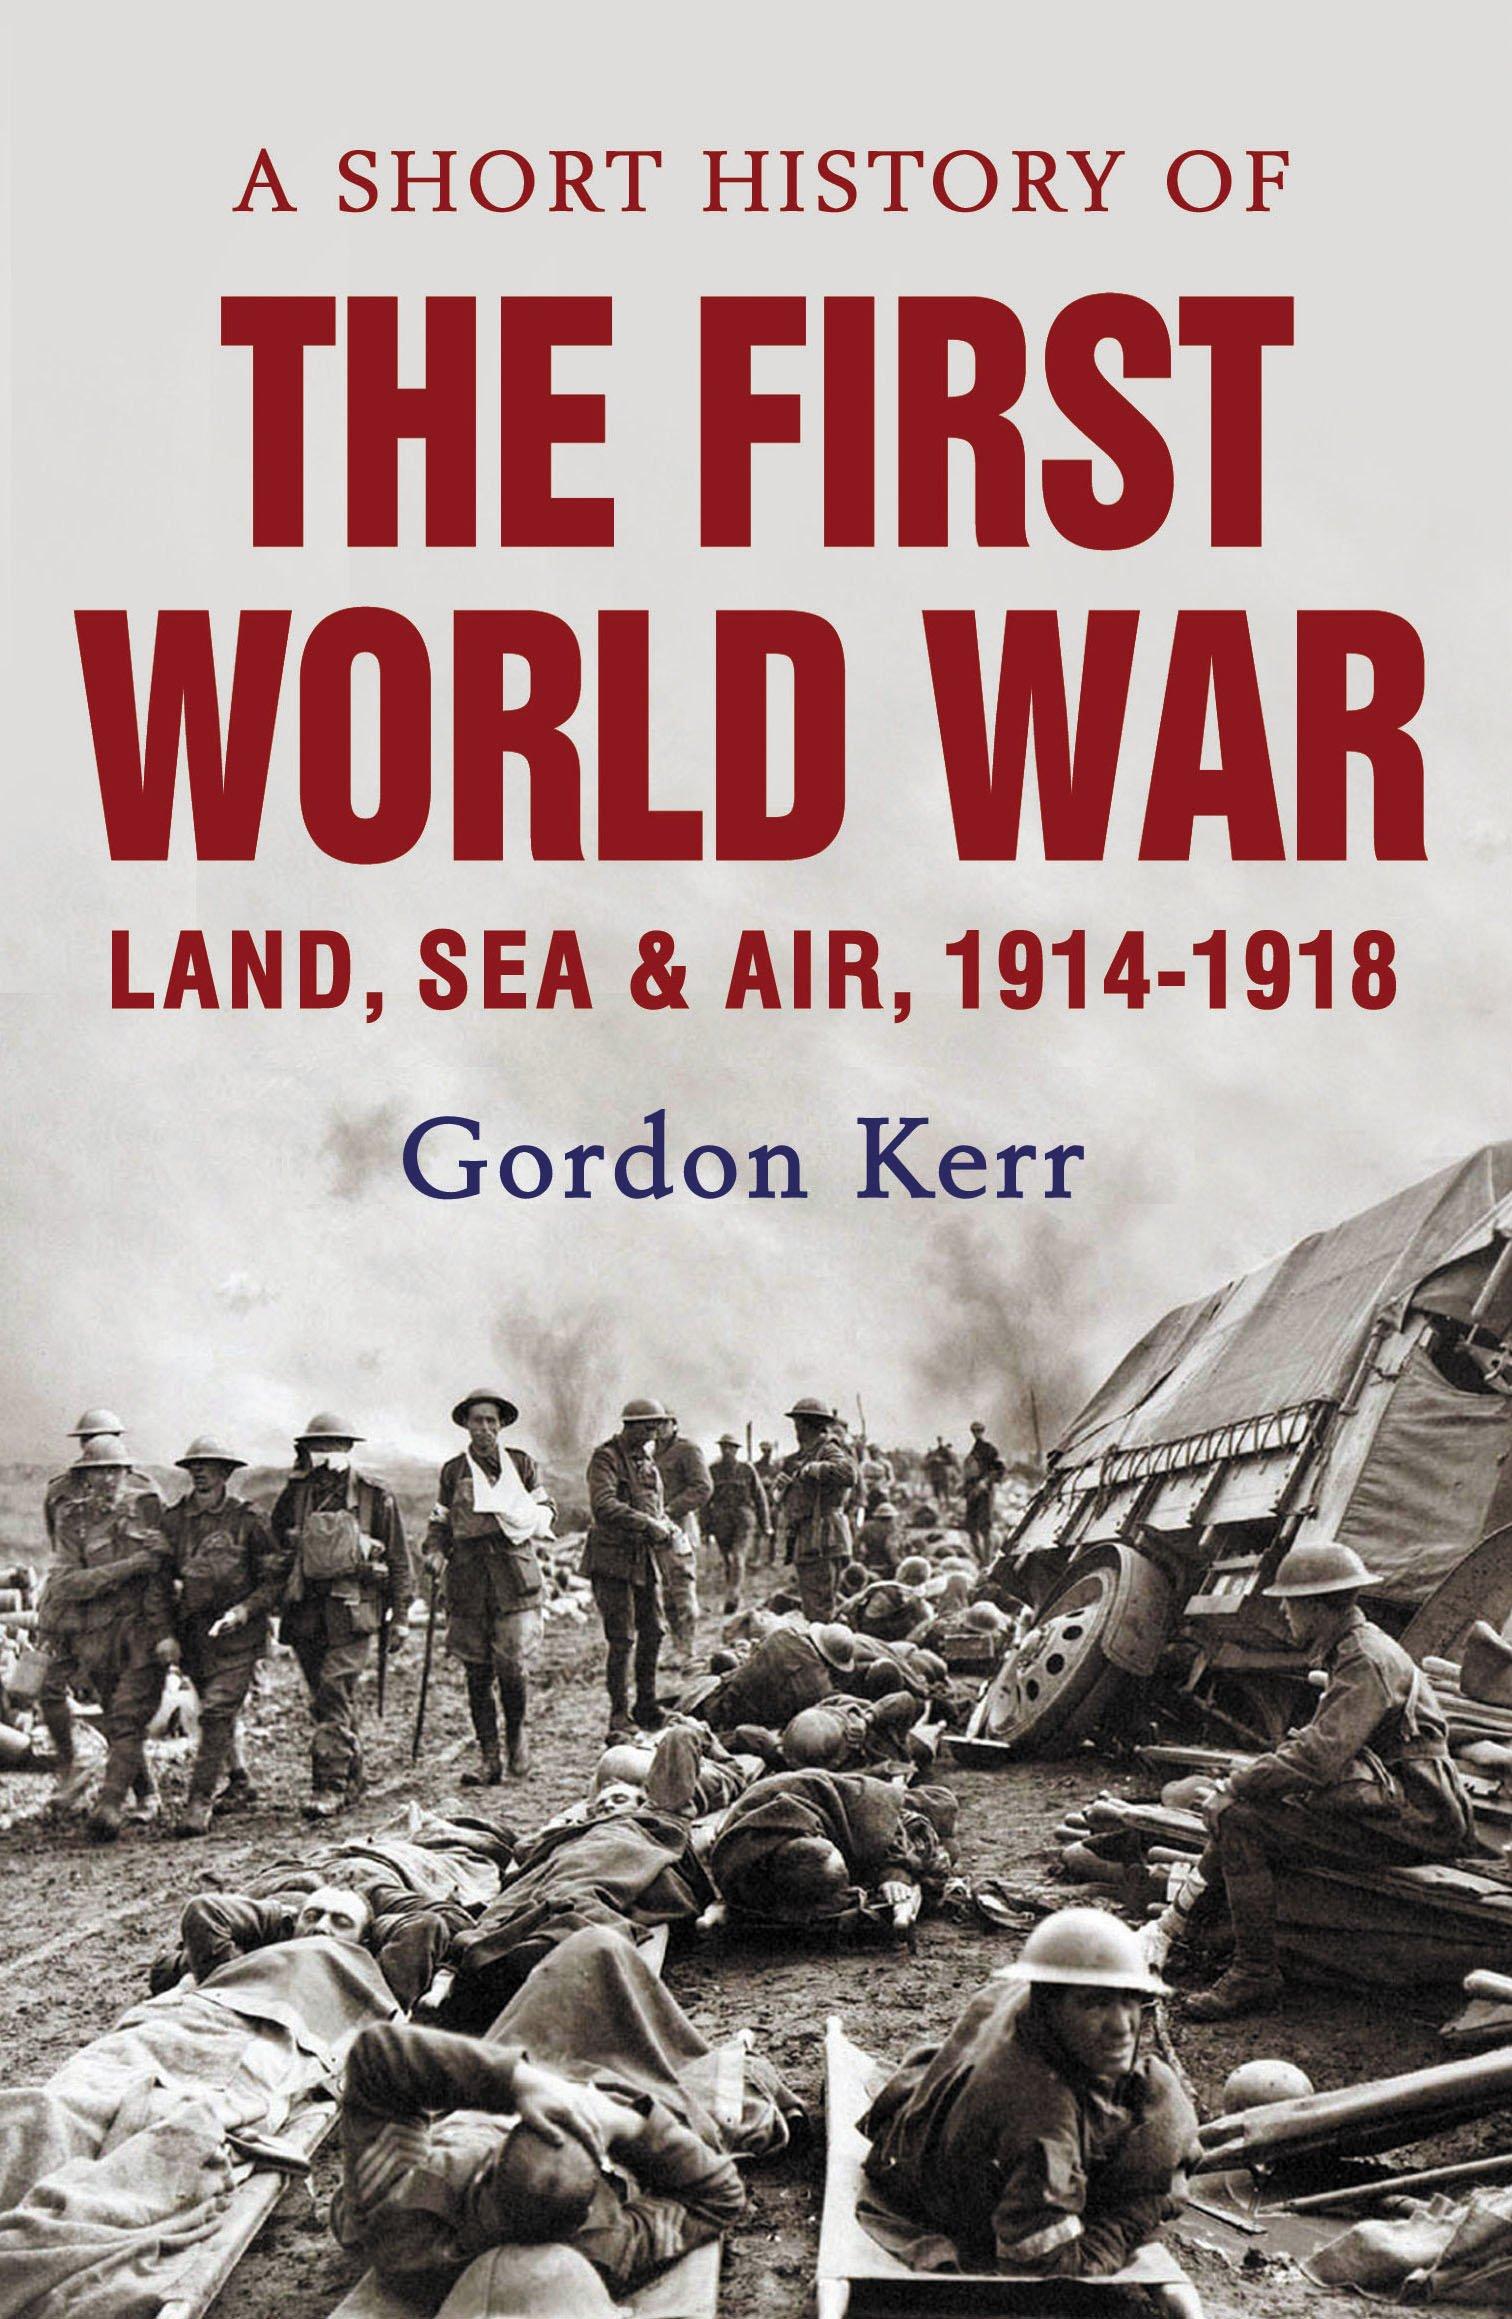 A Short History of the First World War: Land, Sea & Air, 1914-1918 pdf epub